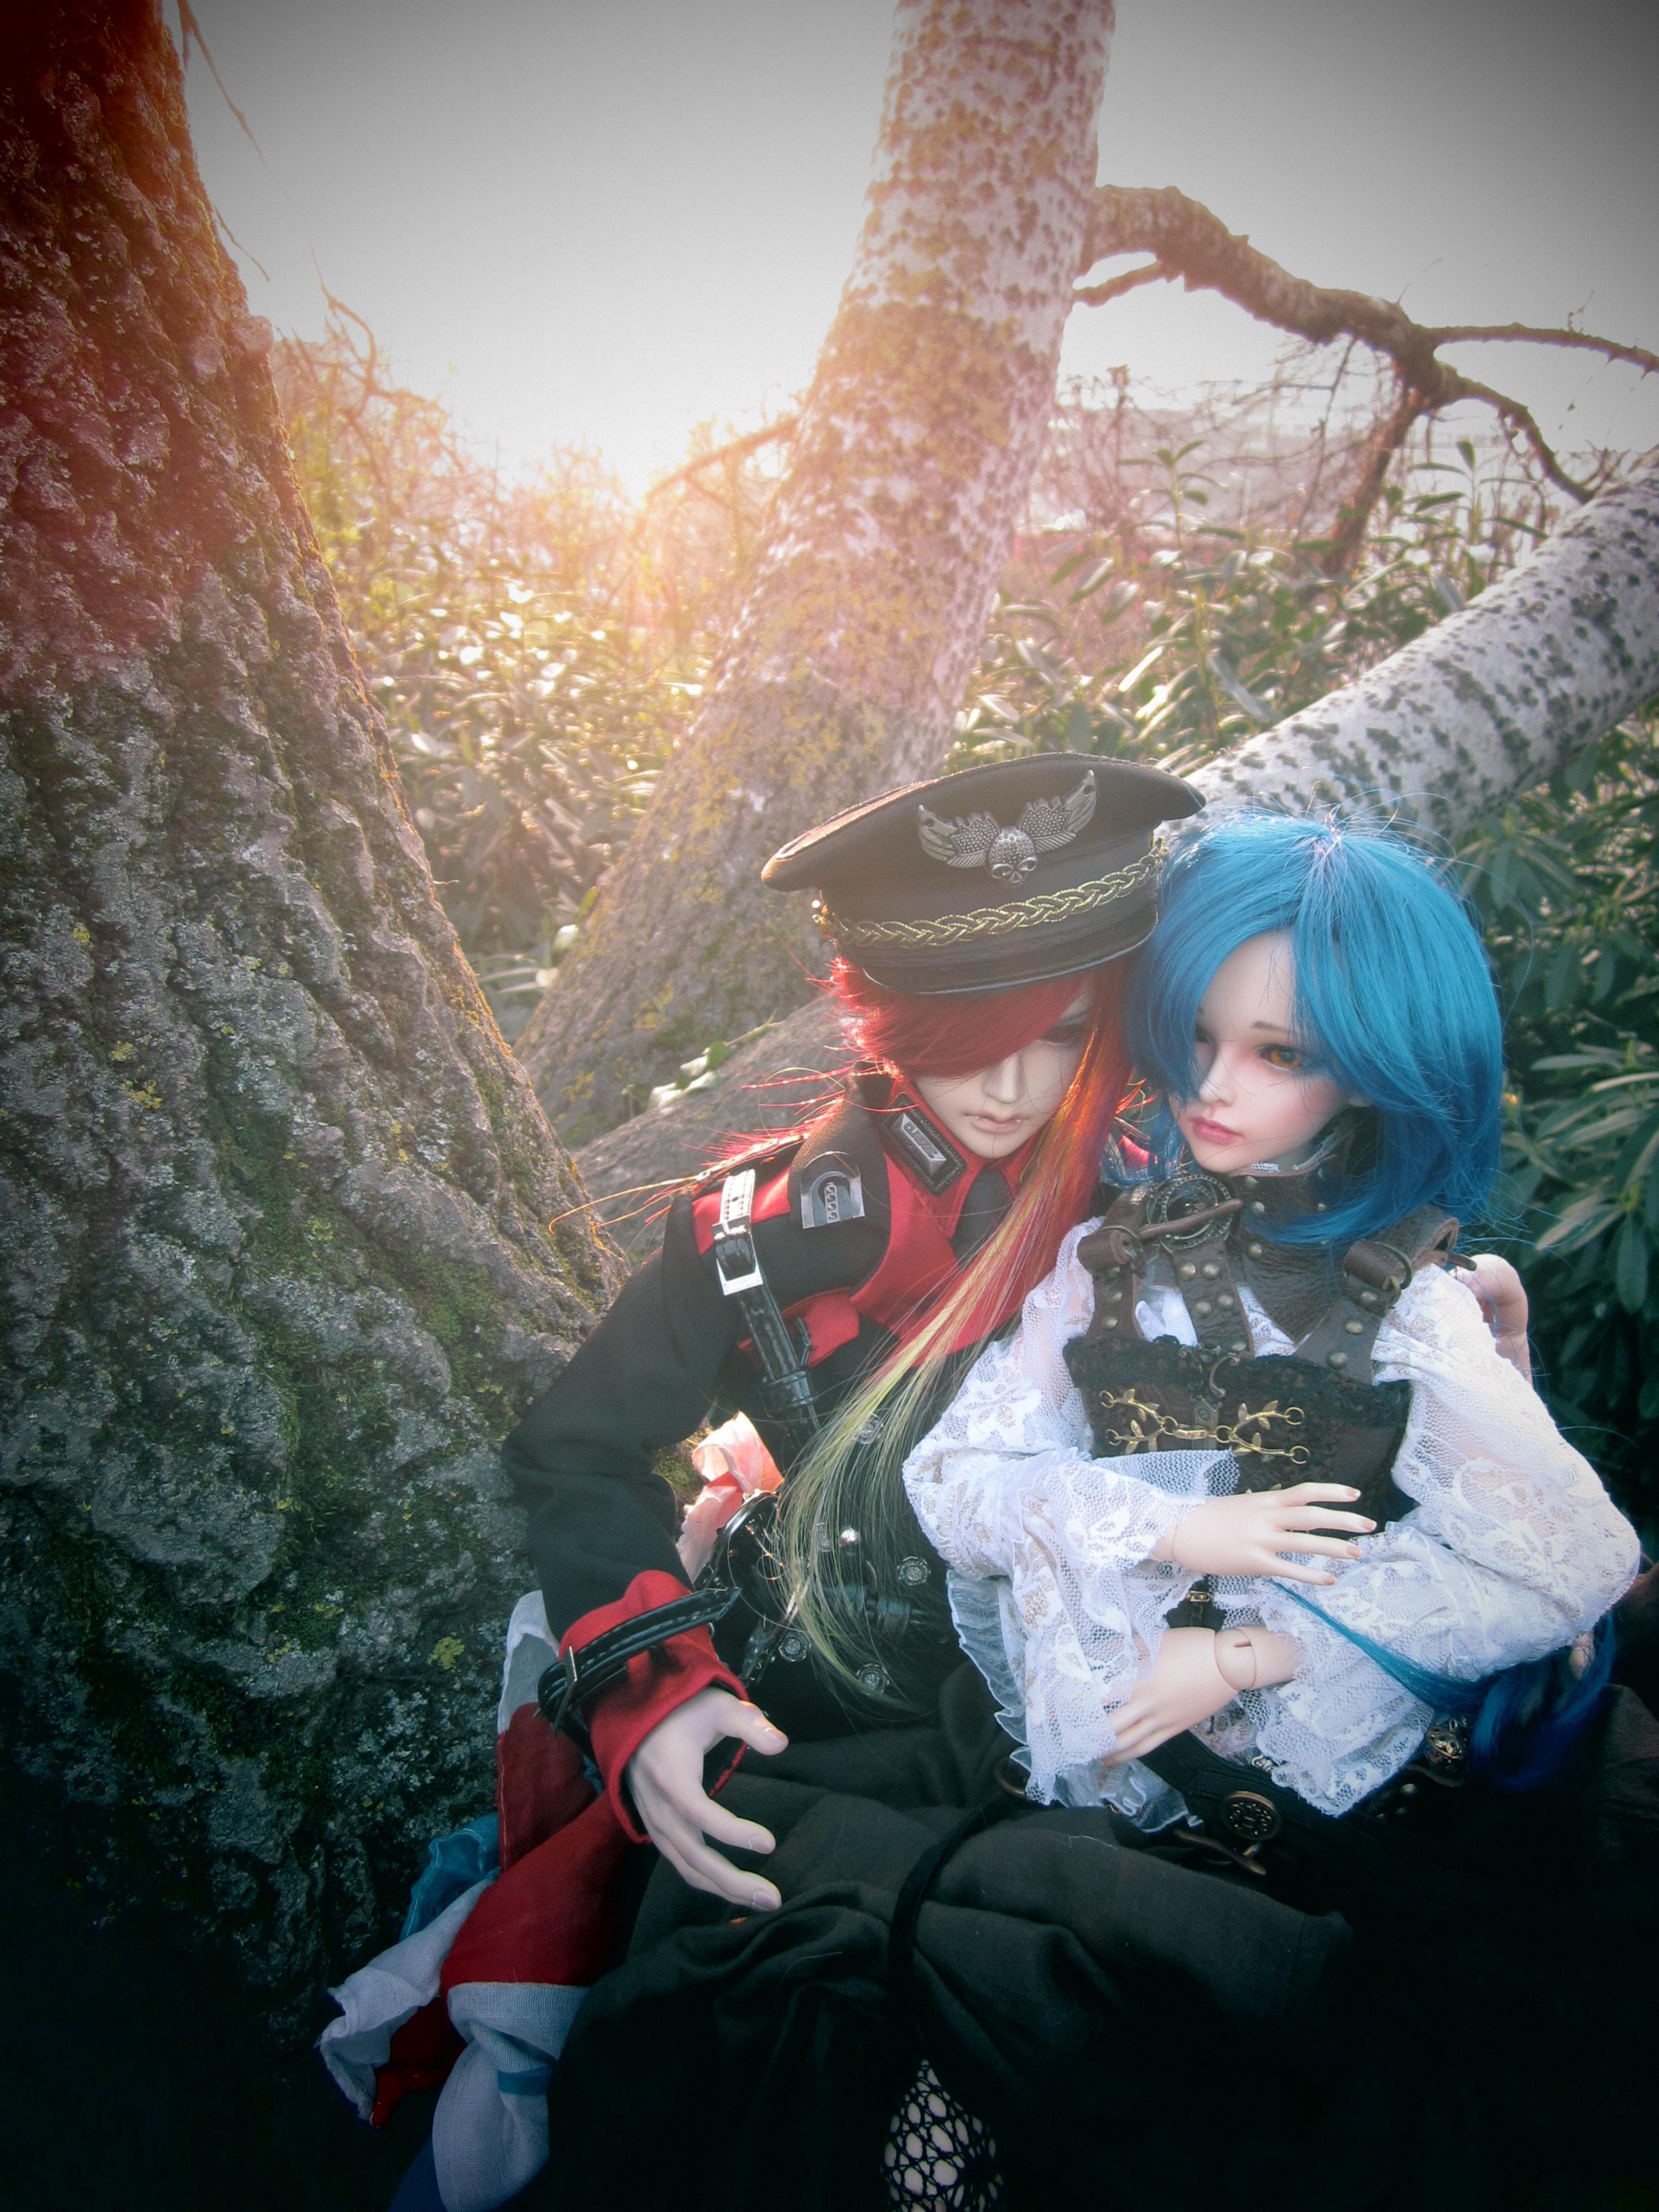 L'auberge C&C. [Leeke, DOD, Fairyland, Soom, AngellStudio] QV9WB4